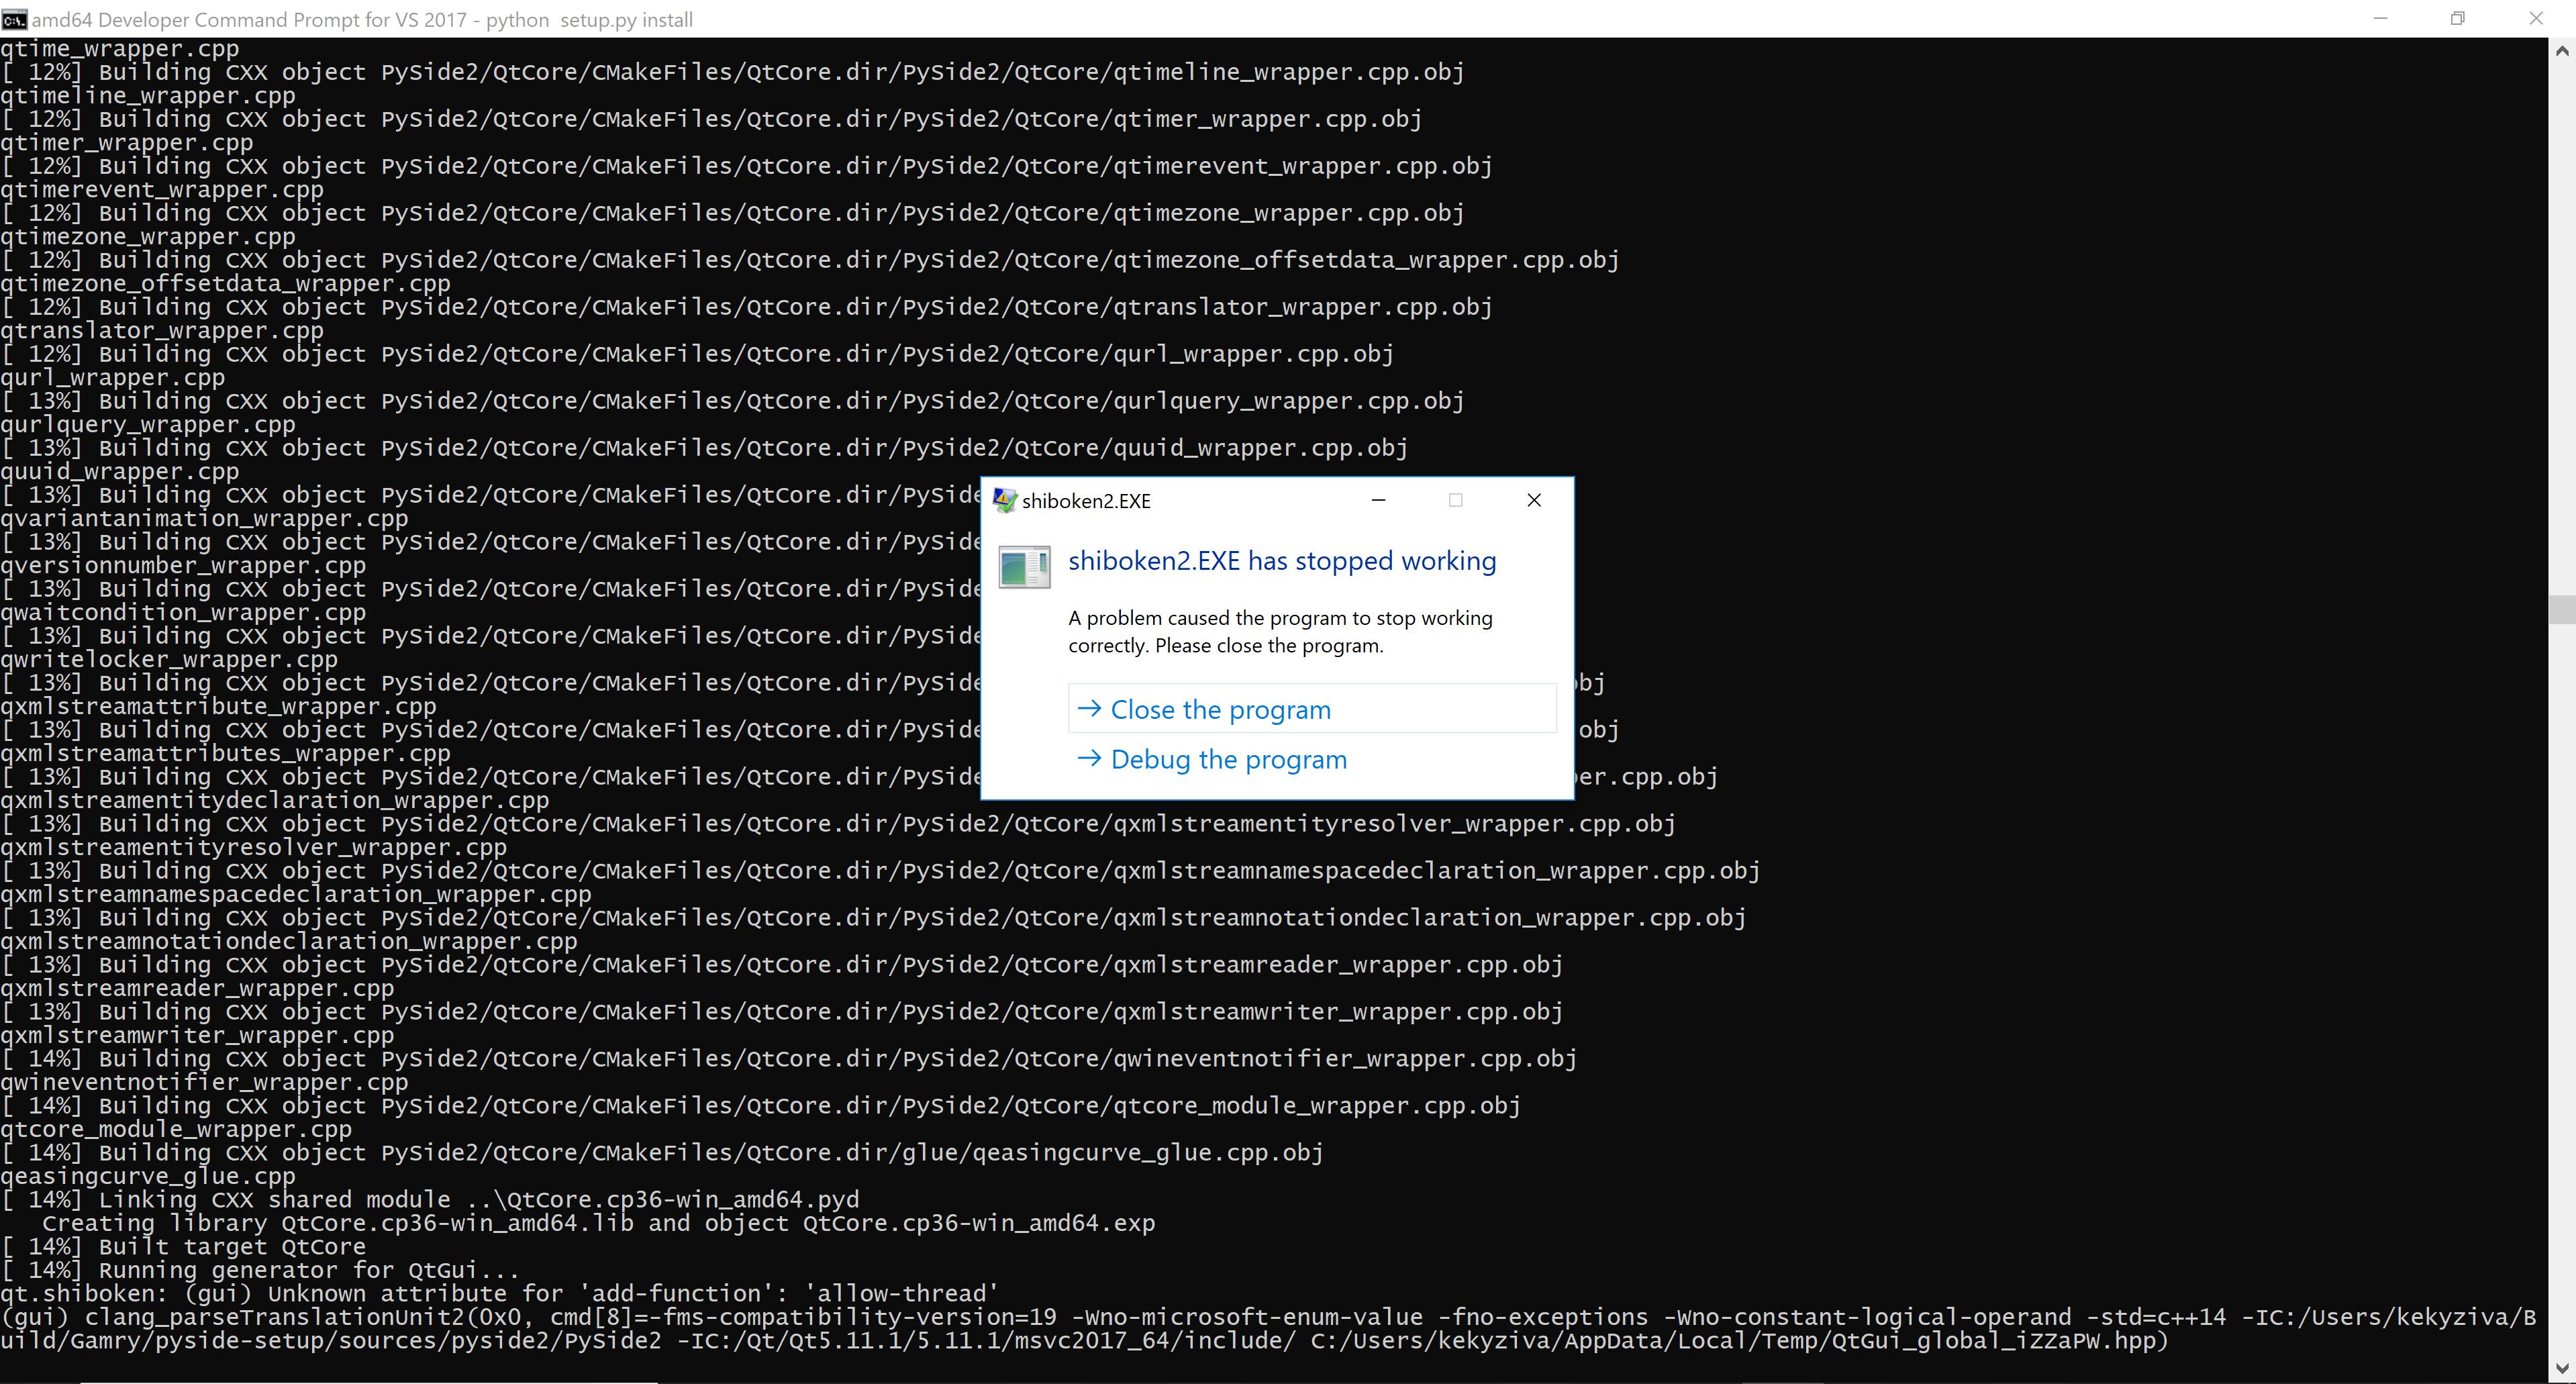 PYSIDE-739] Windows build fails during QtGui bindings